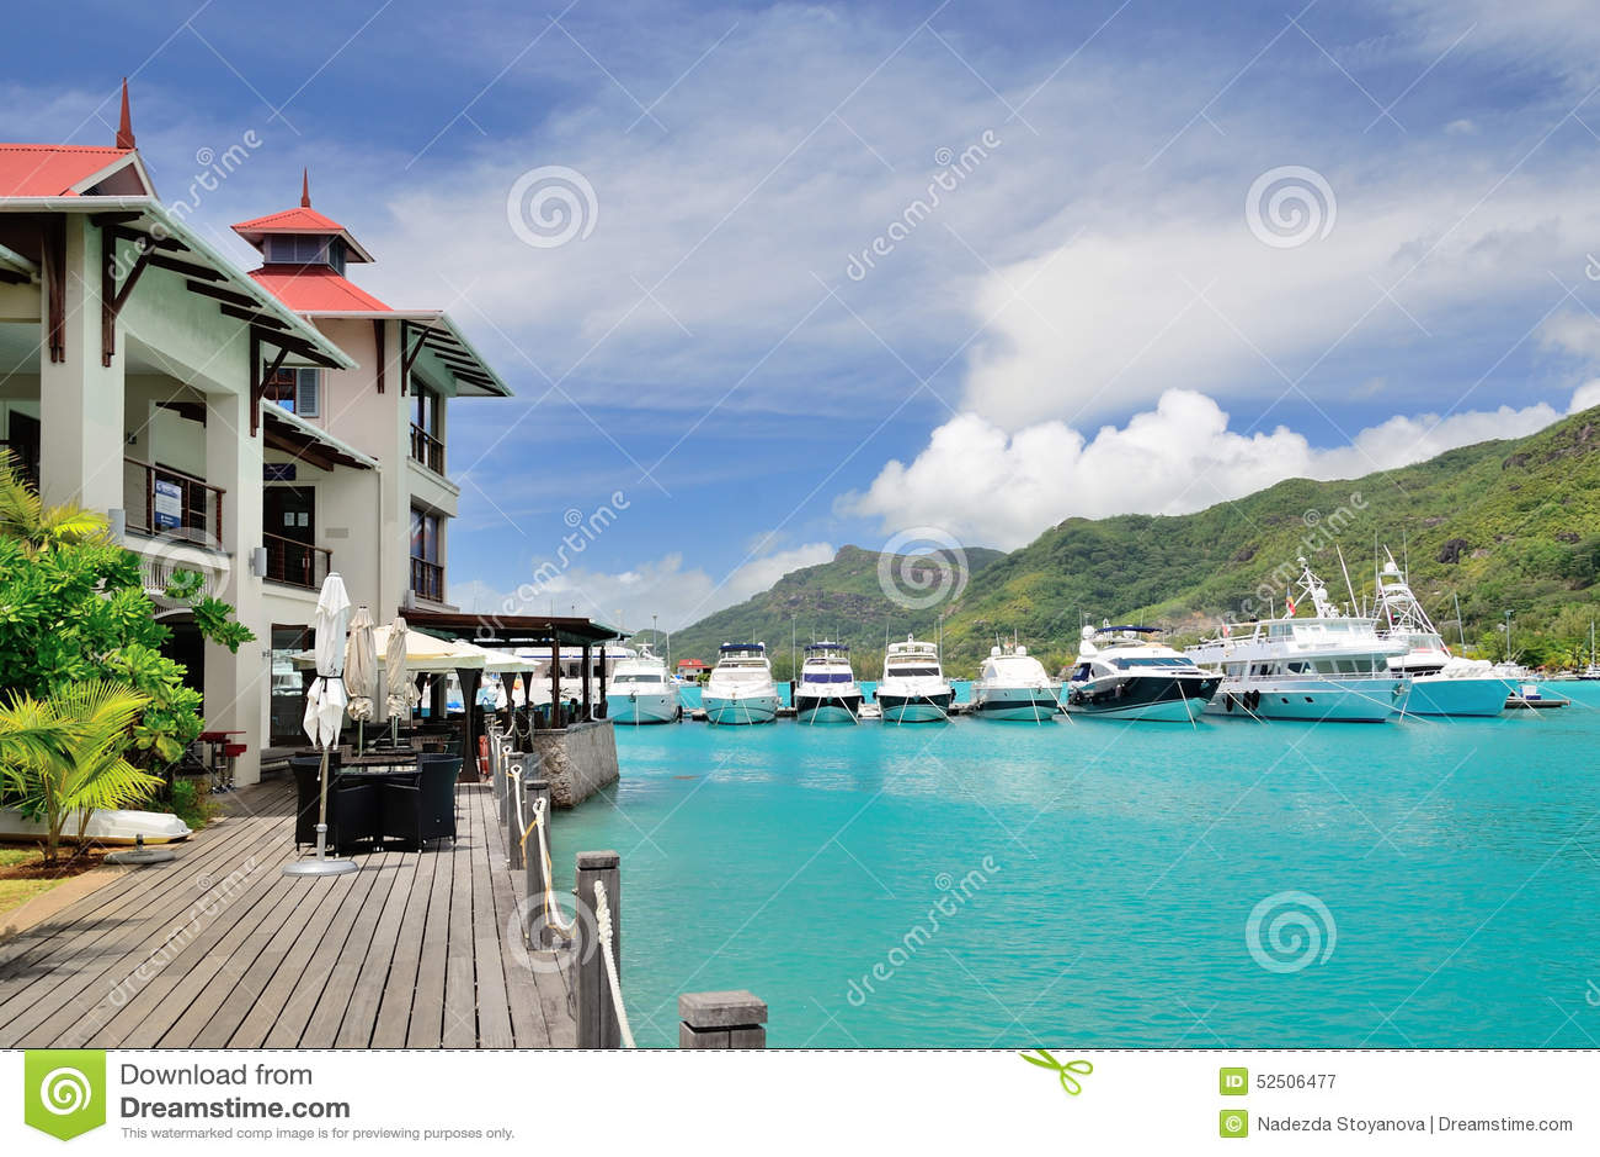 Luxury residency and marina in eden island seychelles editorial photography - Eden island seychelles ...